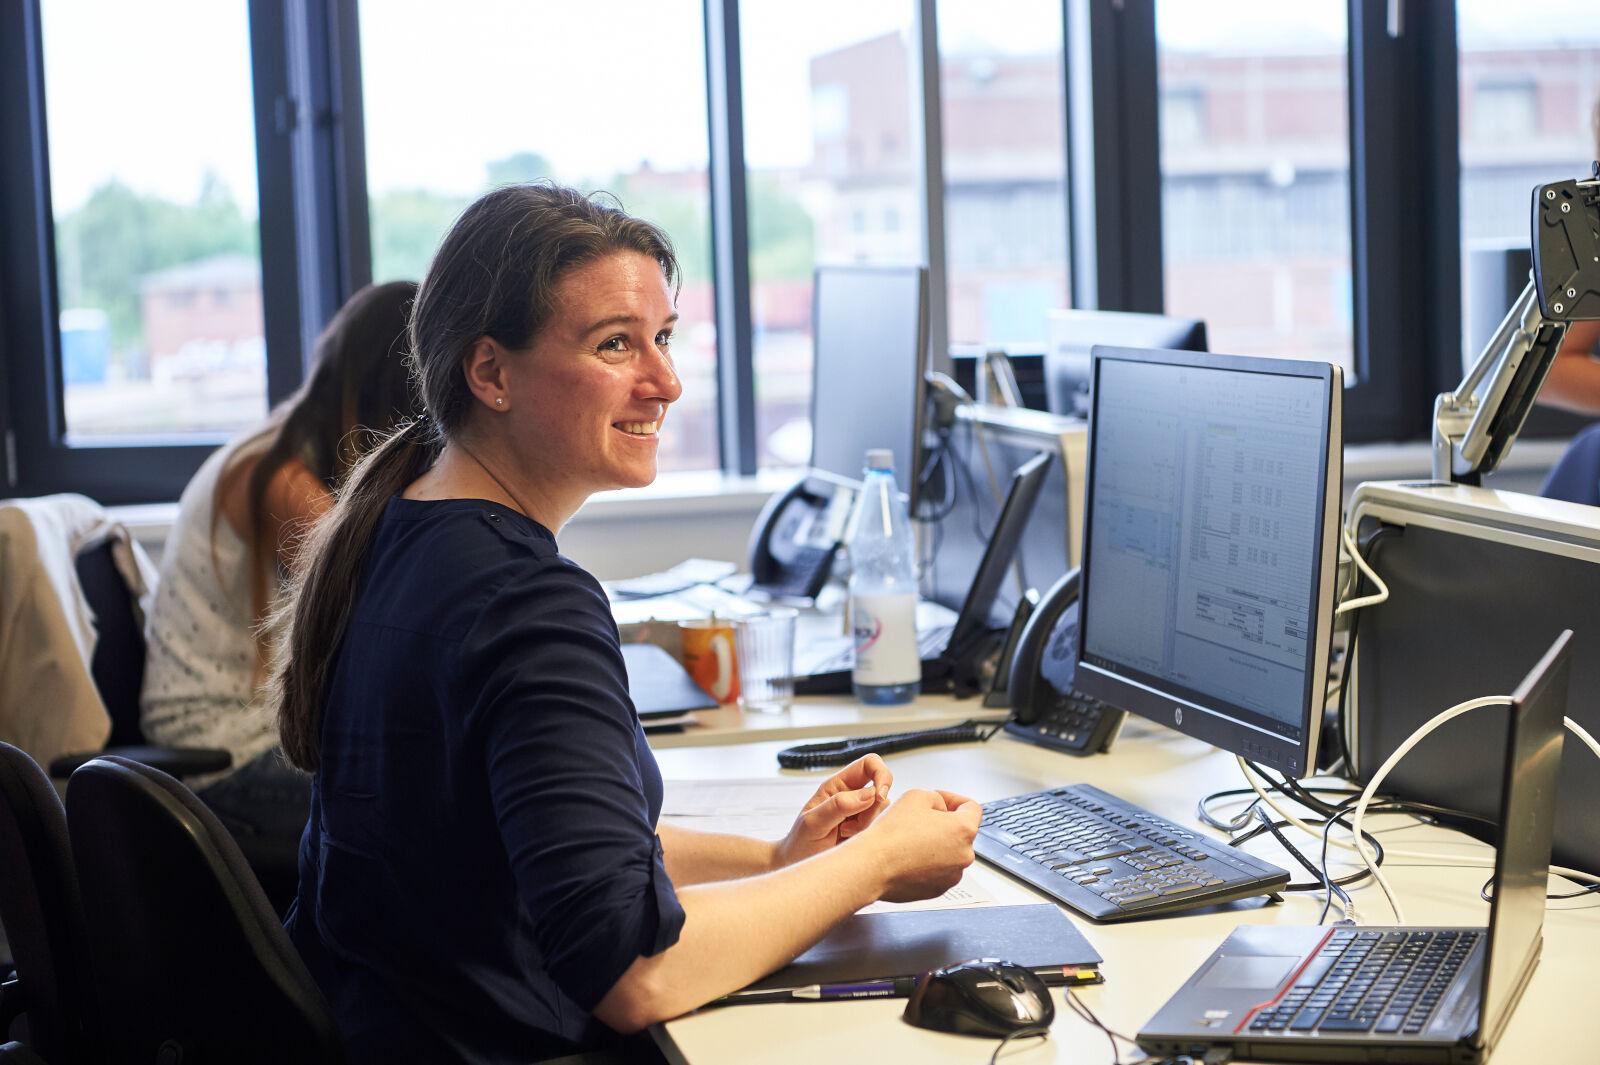 SAP S/4HANA Berater CO/PS/PPM (m/w/d) - Job Bremen, Homeoffice - Jobs   team neusta Karriereportal